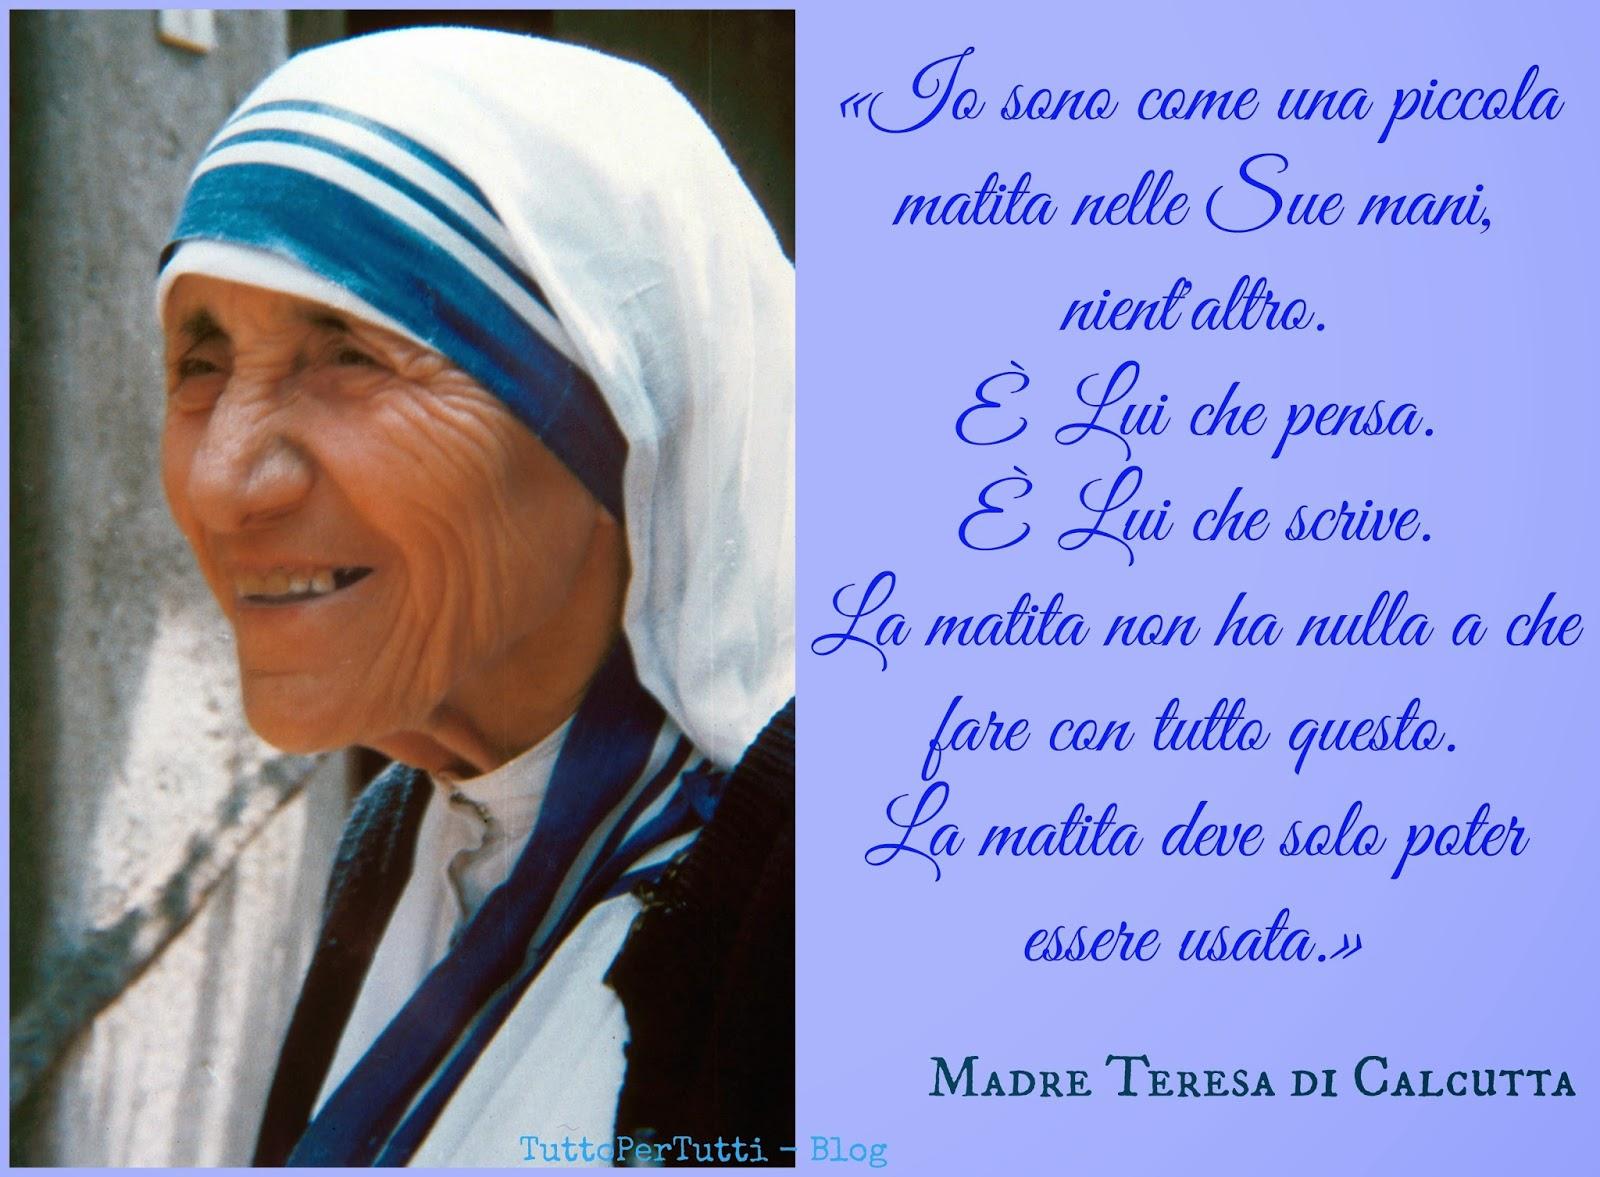 Frasi Madre Teresa Di Calcutta Per Bambini